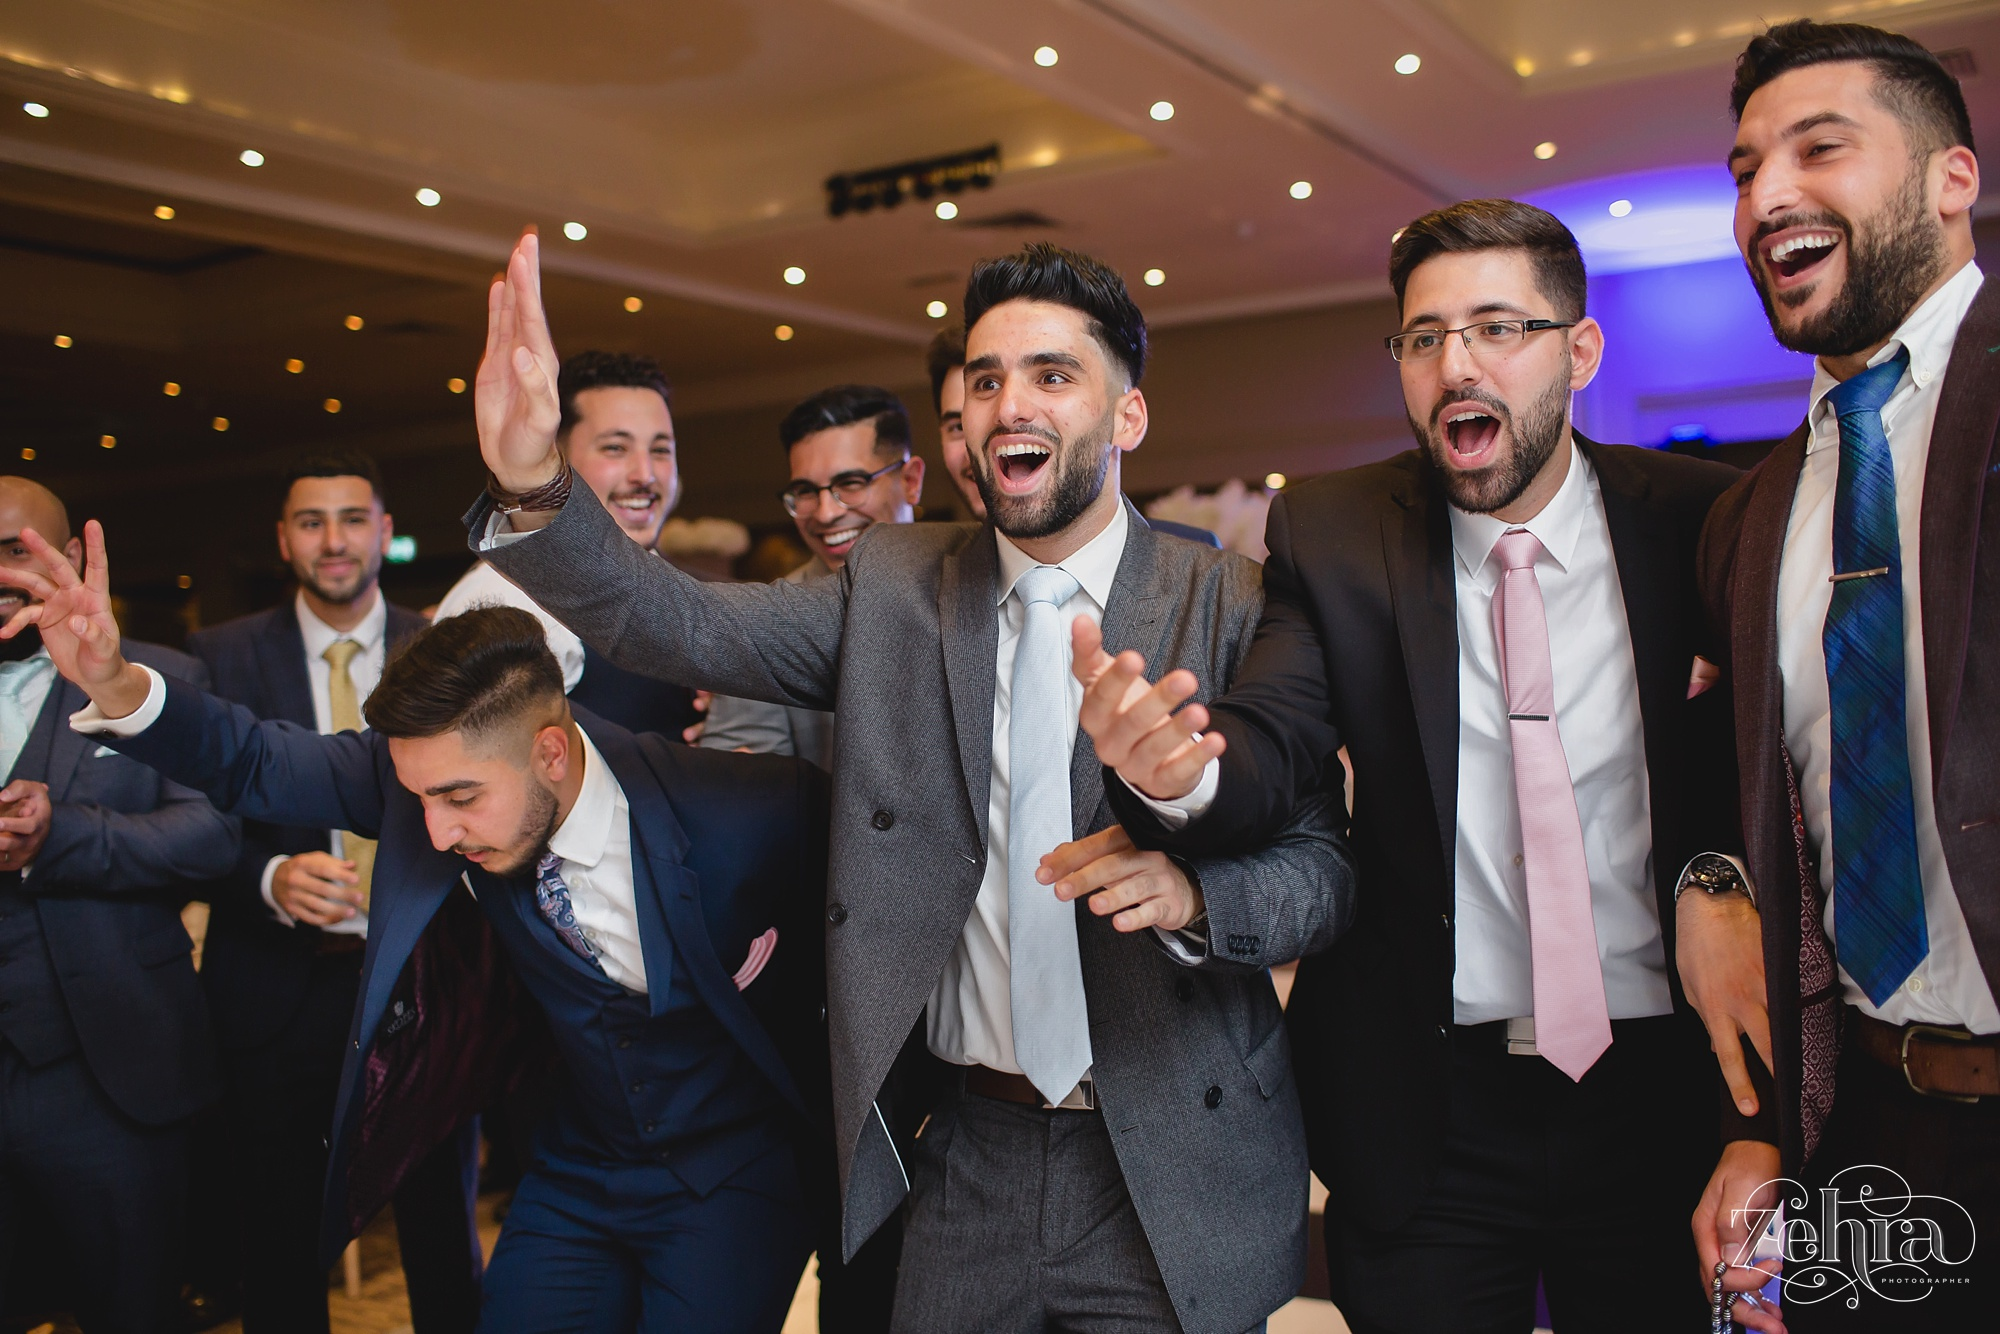 zehra photographer mere cheshire wedding_0034.jpg